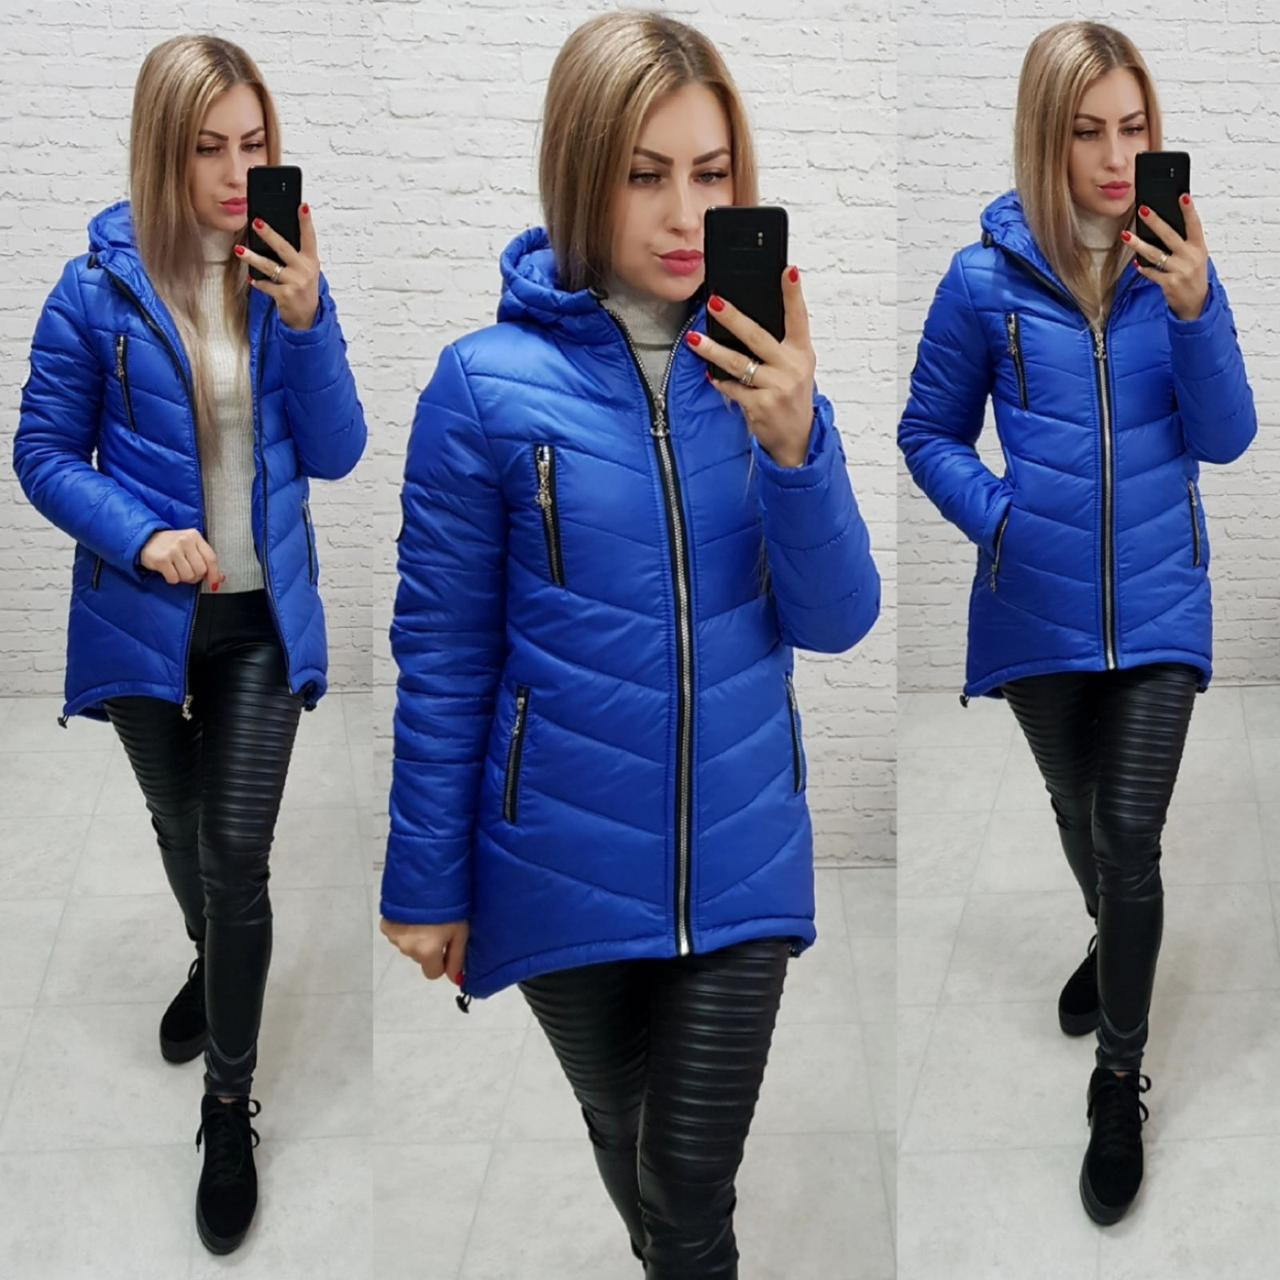 Куртка (арт. 300) ярко-синий / цвет электрик / синяя яркая